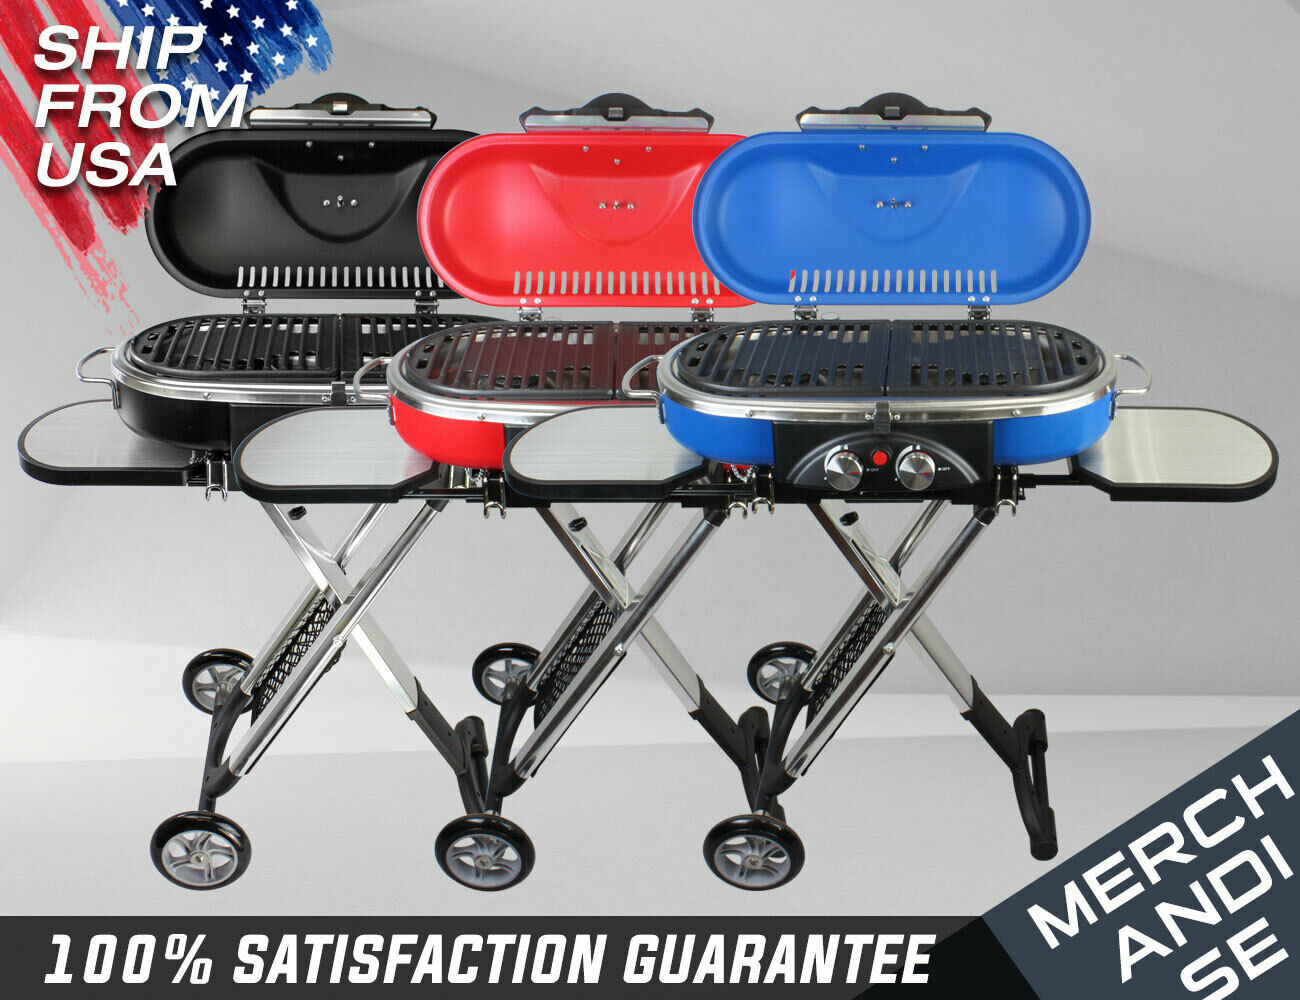 Portable Mini BBQ Grill 3 Colors Propane Foldable Cart, Camp